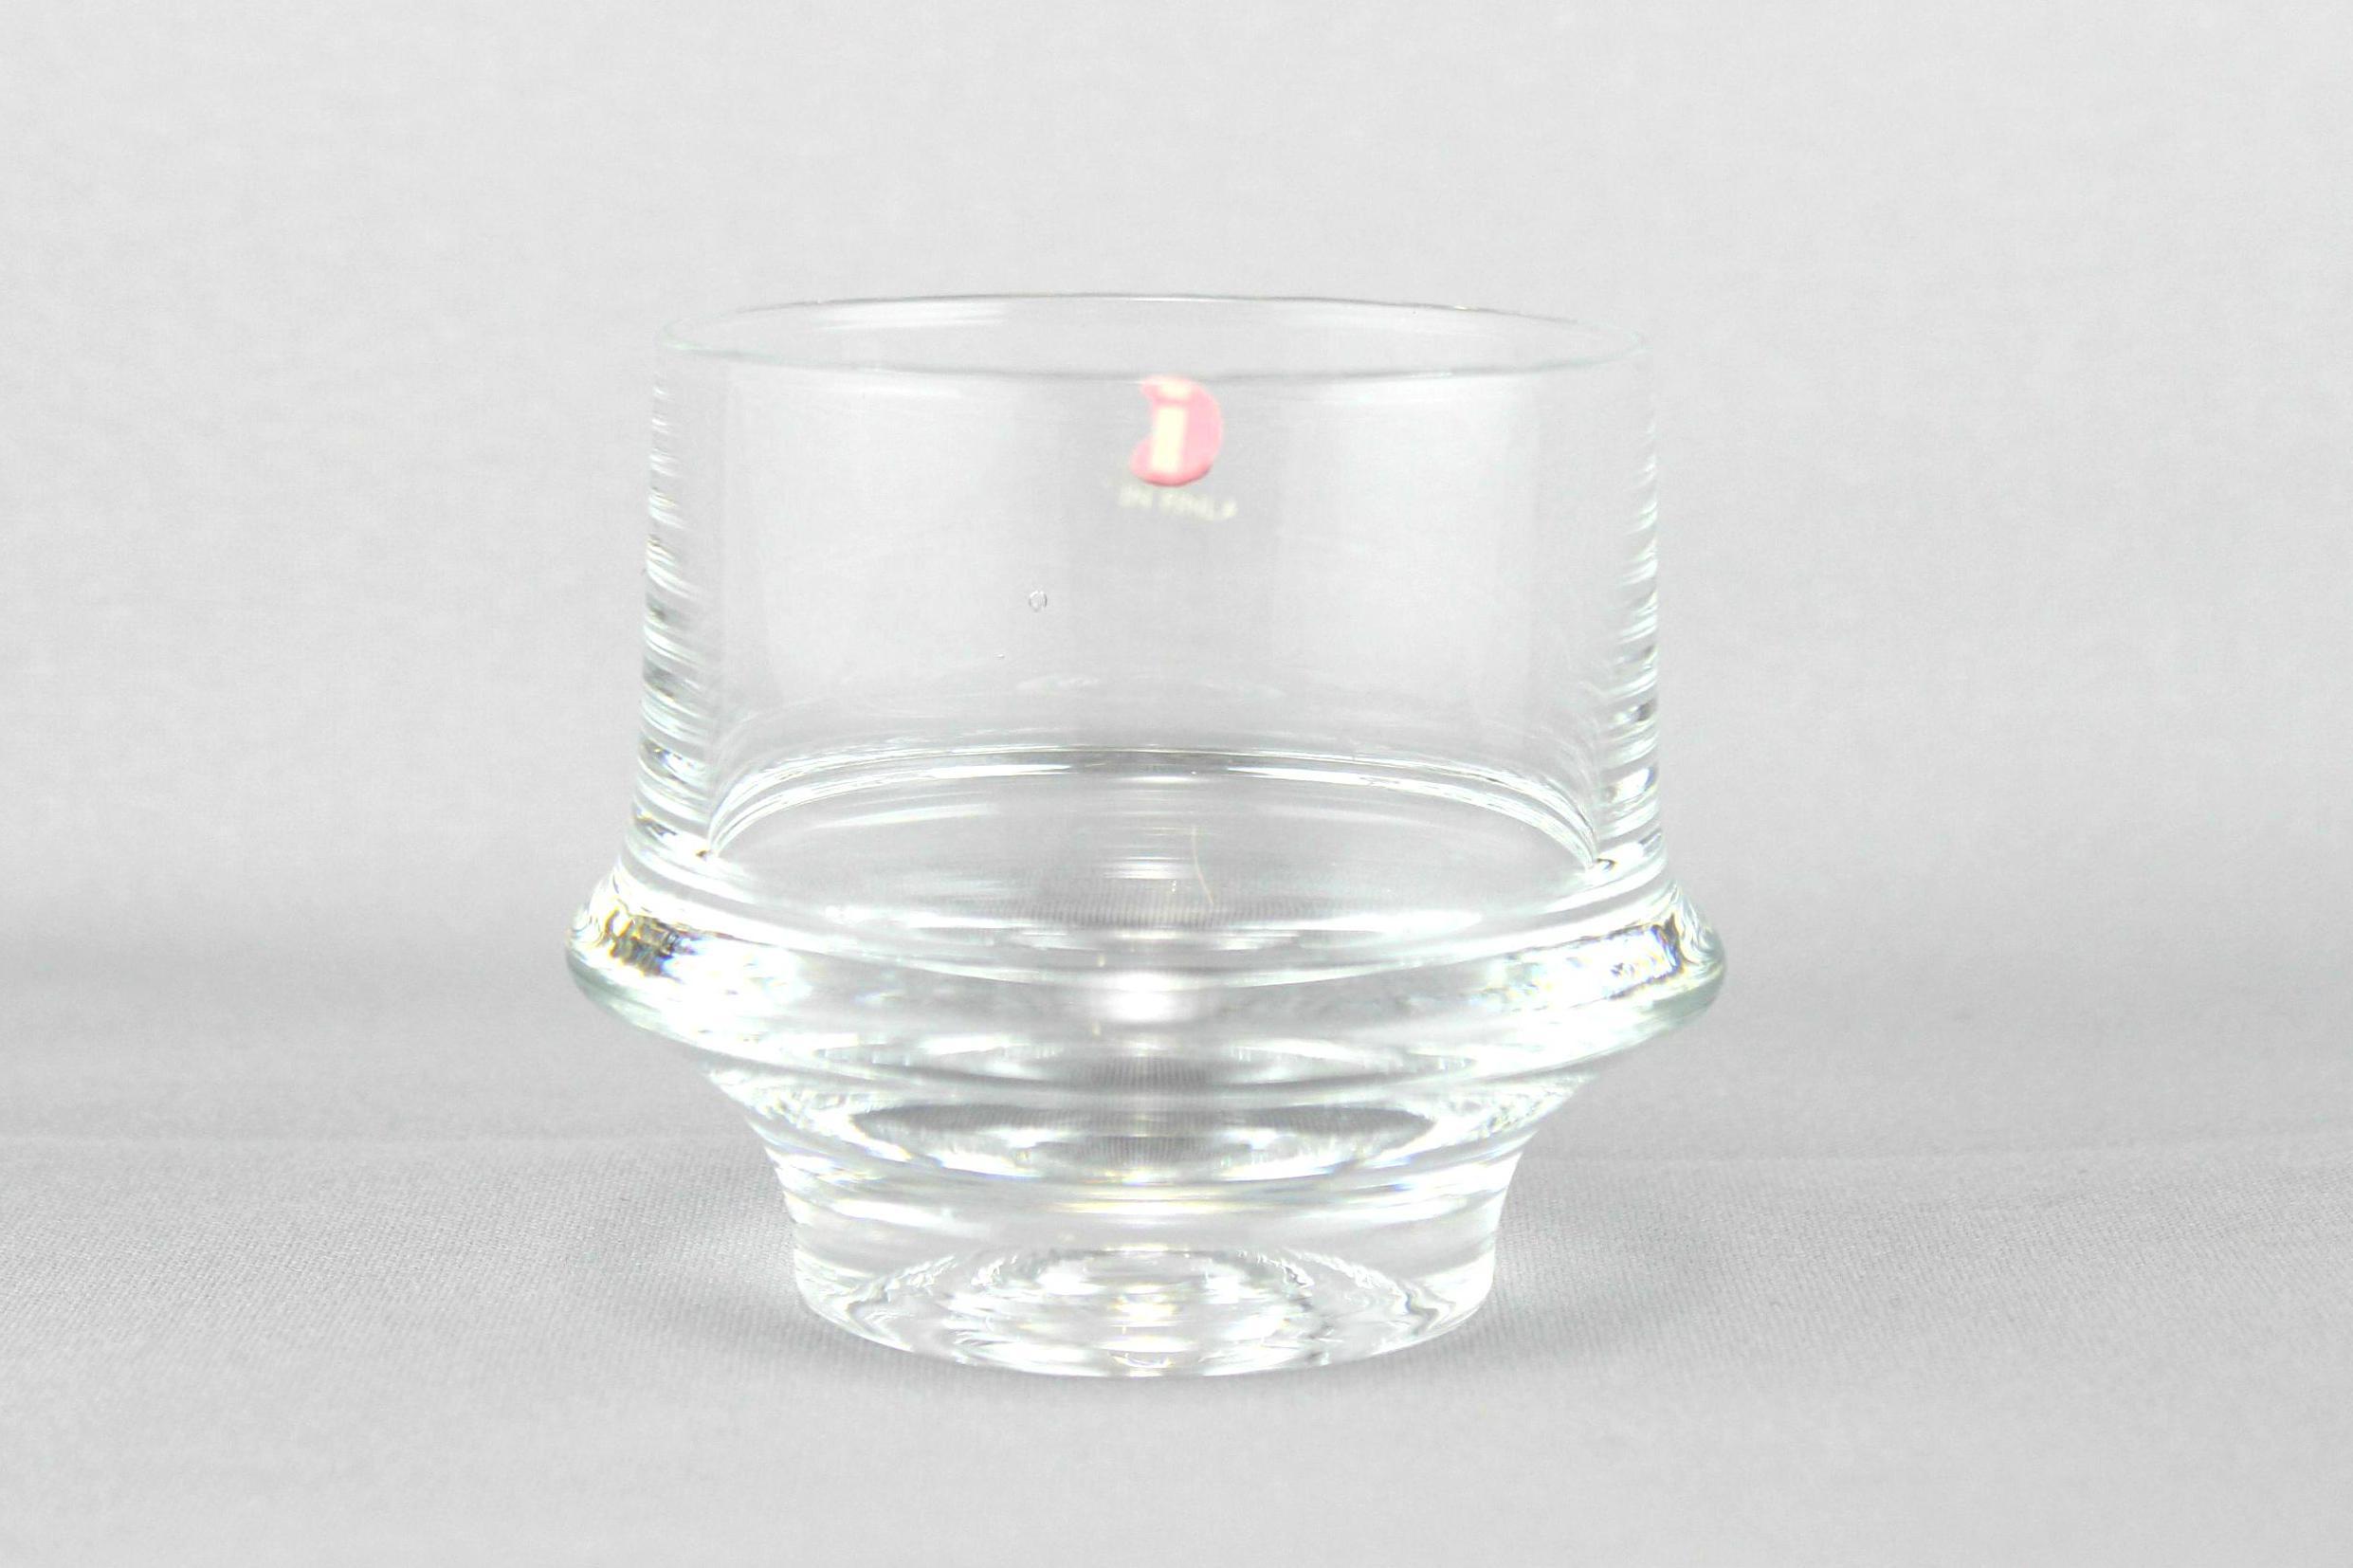 6 x tapio wirkkala iittala marski cocktail glasses boxed finnish glass ebay. Black Bedroom Furniture Sets. Home Design Ideas